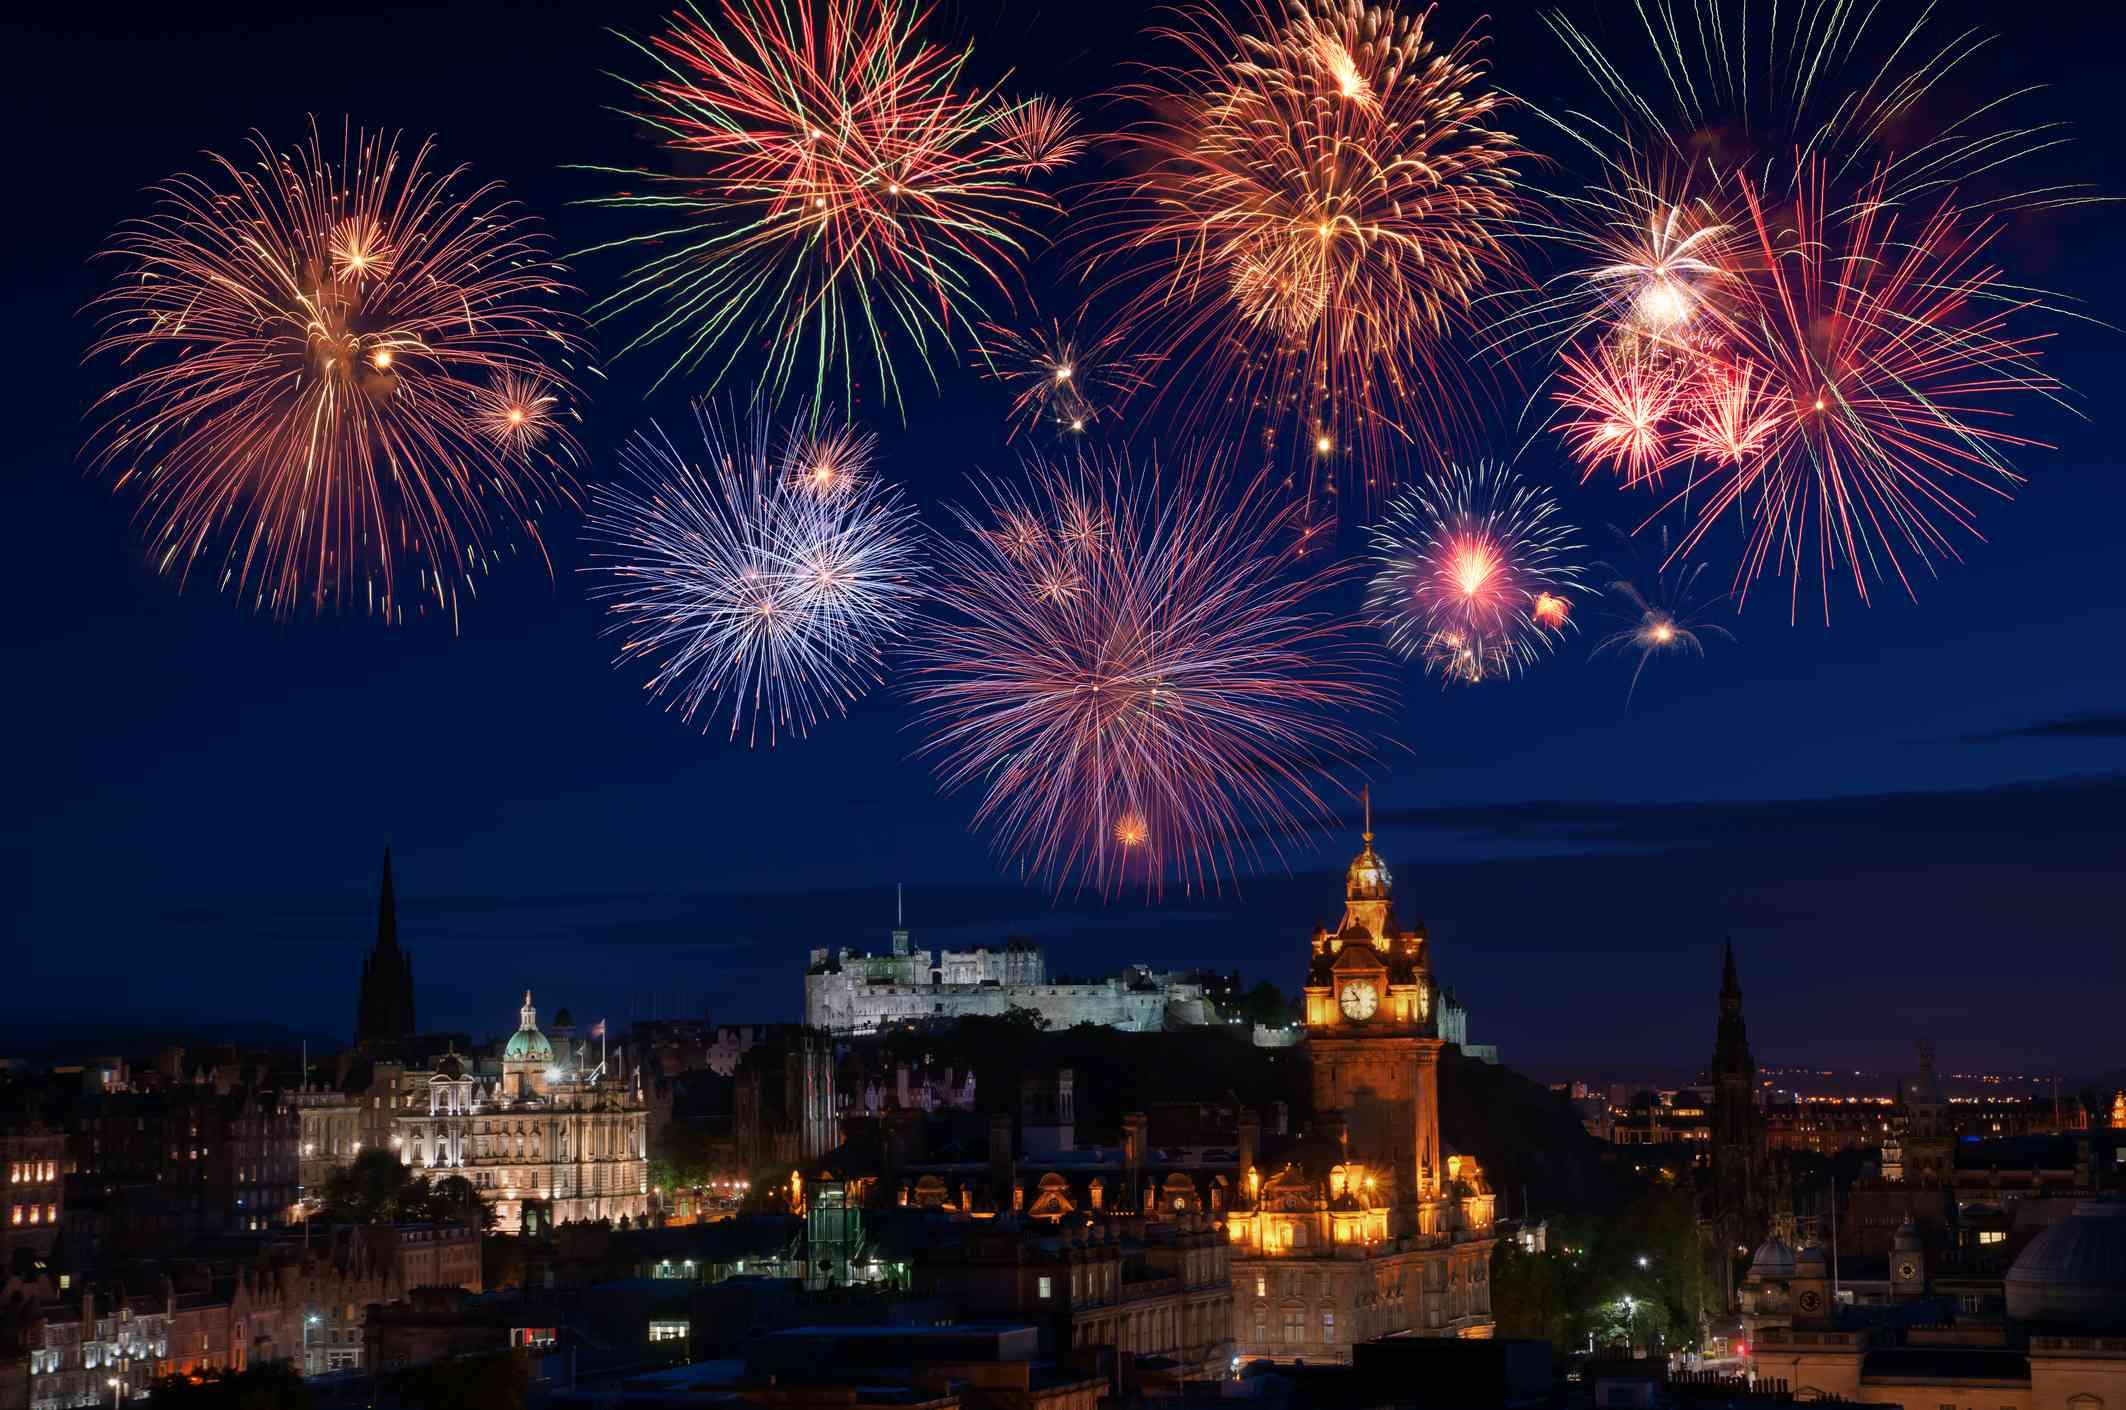 New Years fireworks over the city of Edinburgh